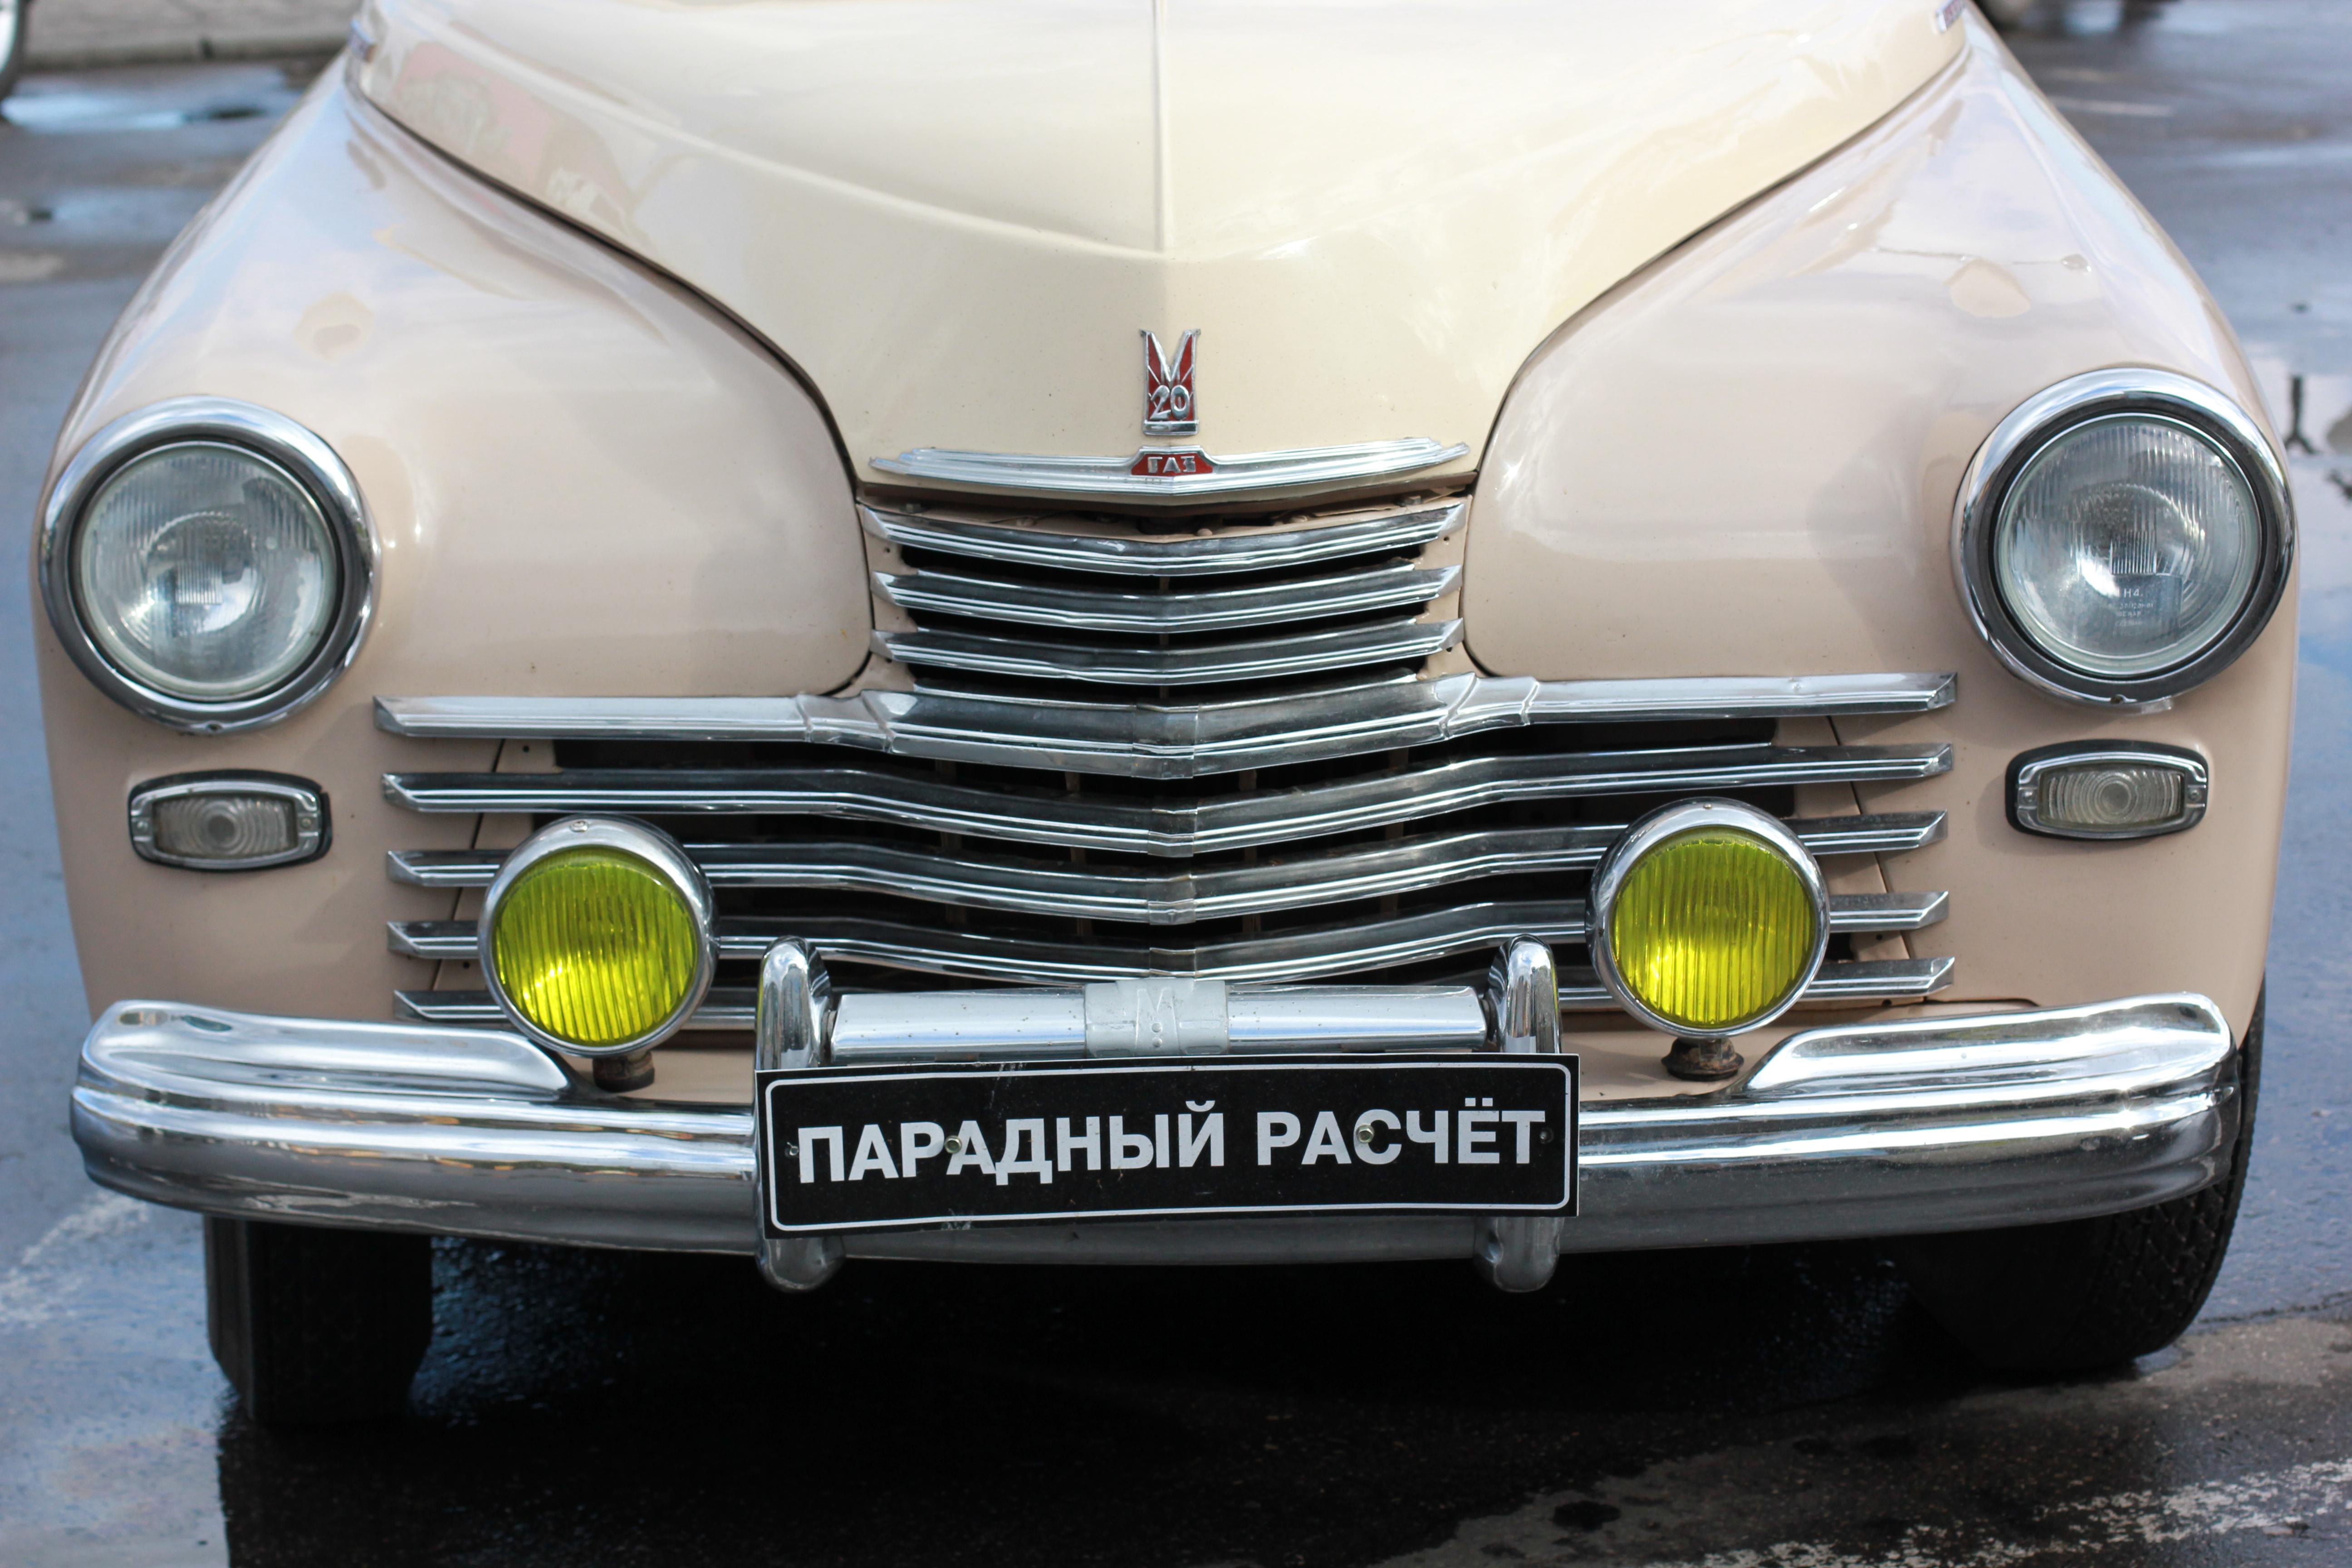 http://s3.uploads.ru/jWrsf.jpg